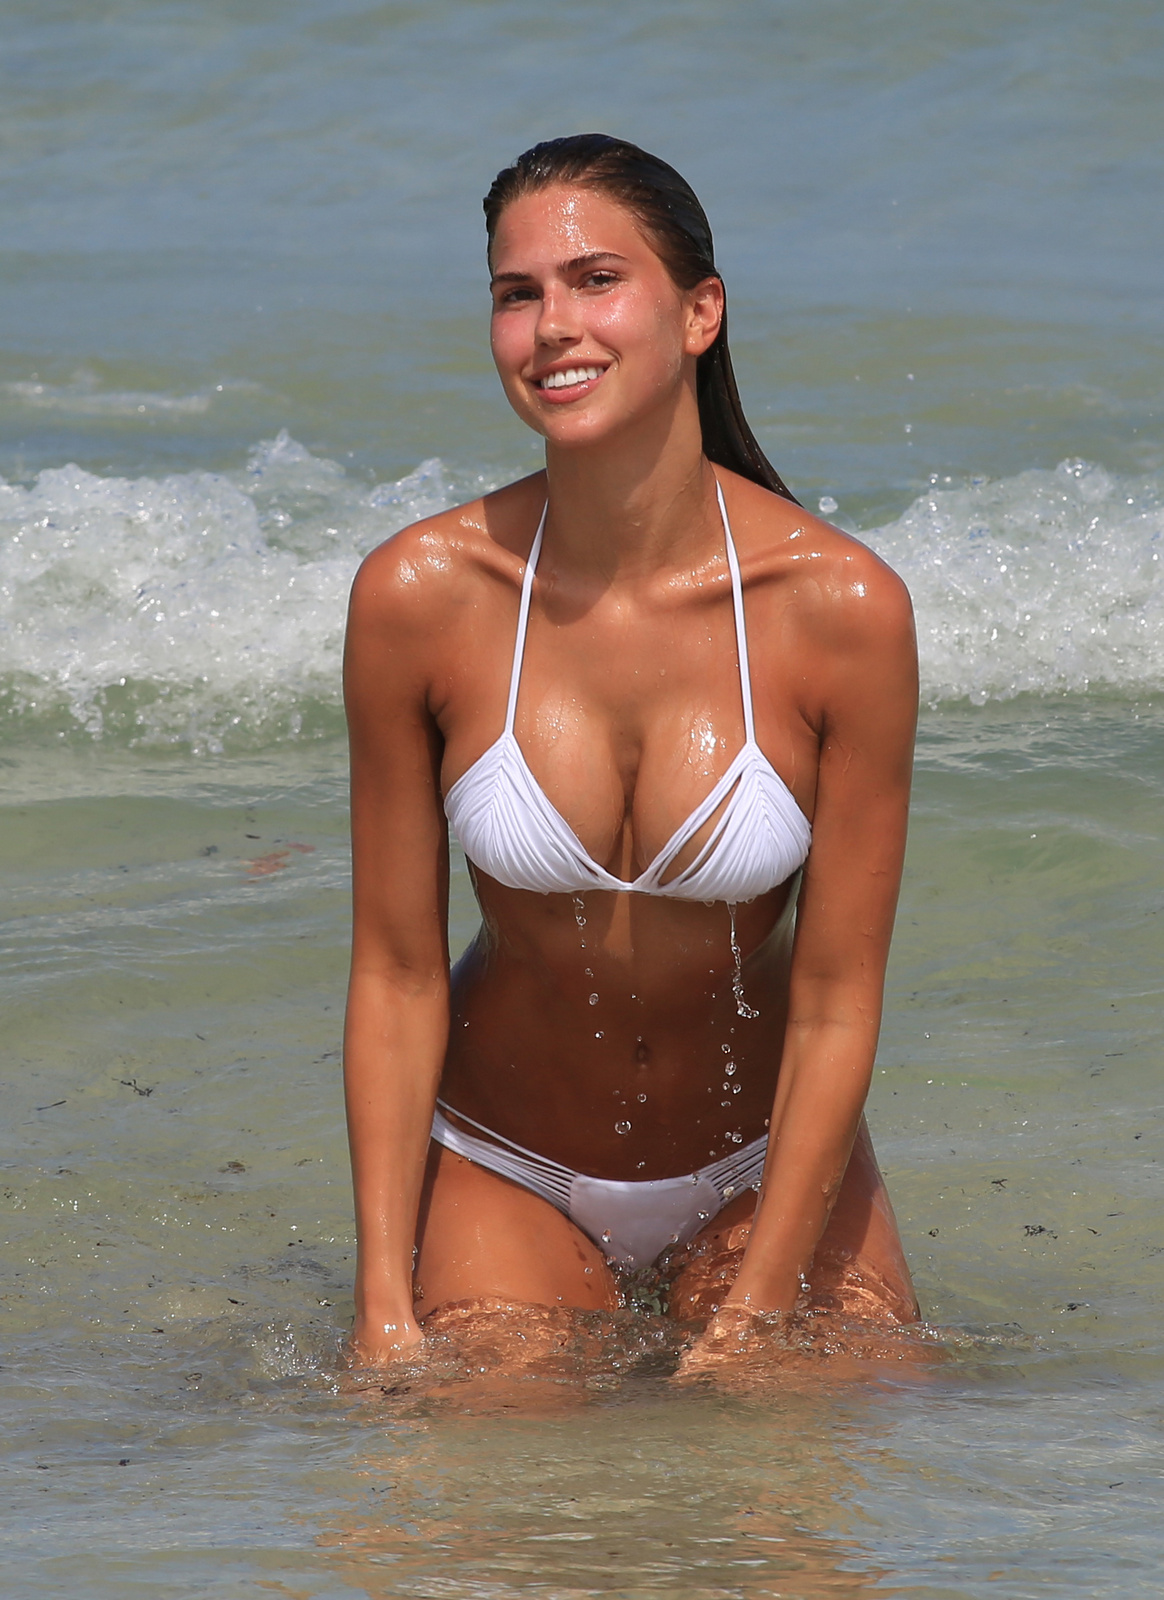 Kara Del Toro - Bikini photoshoot (Miami)